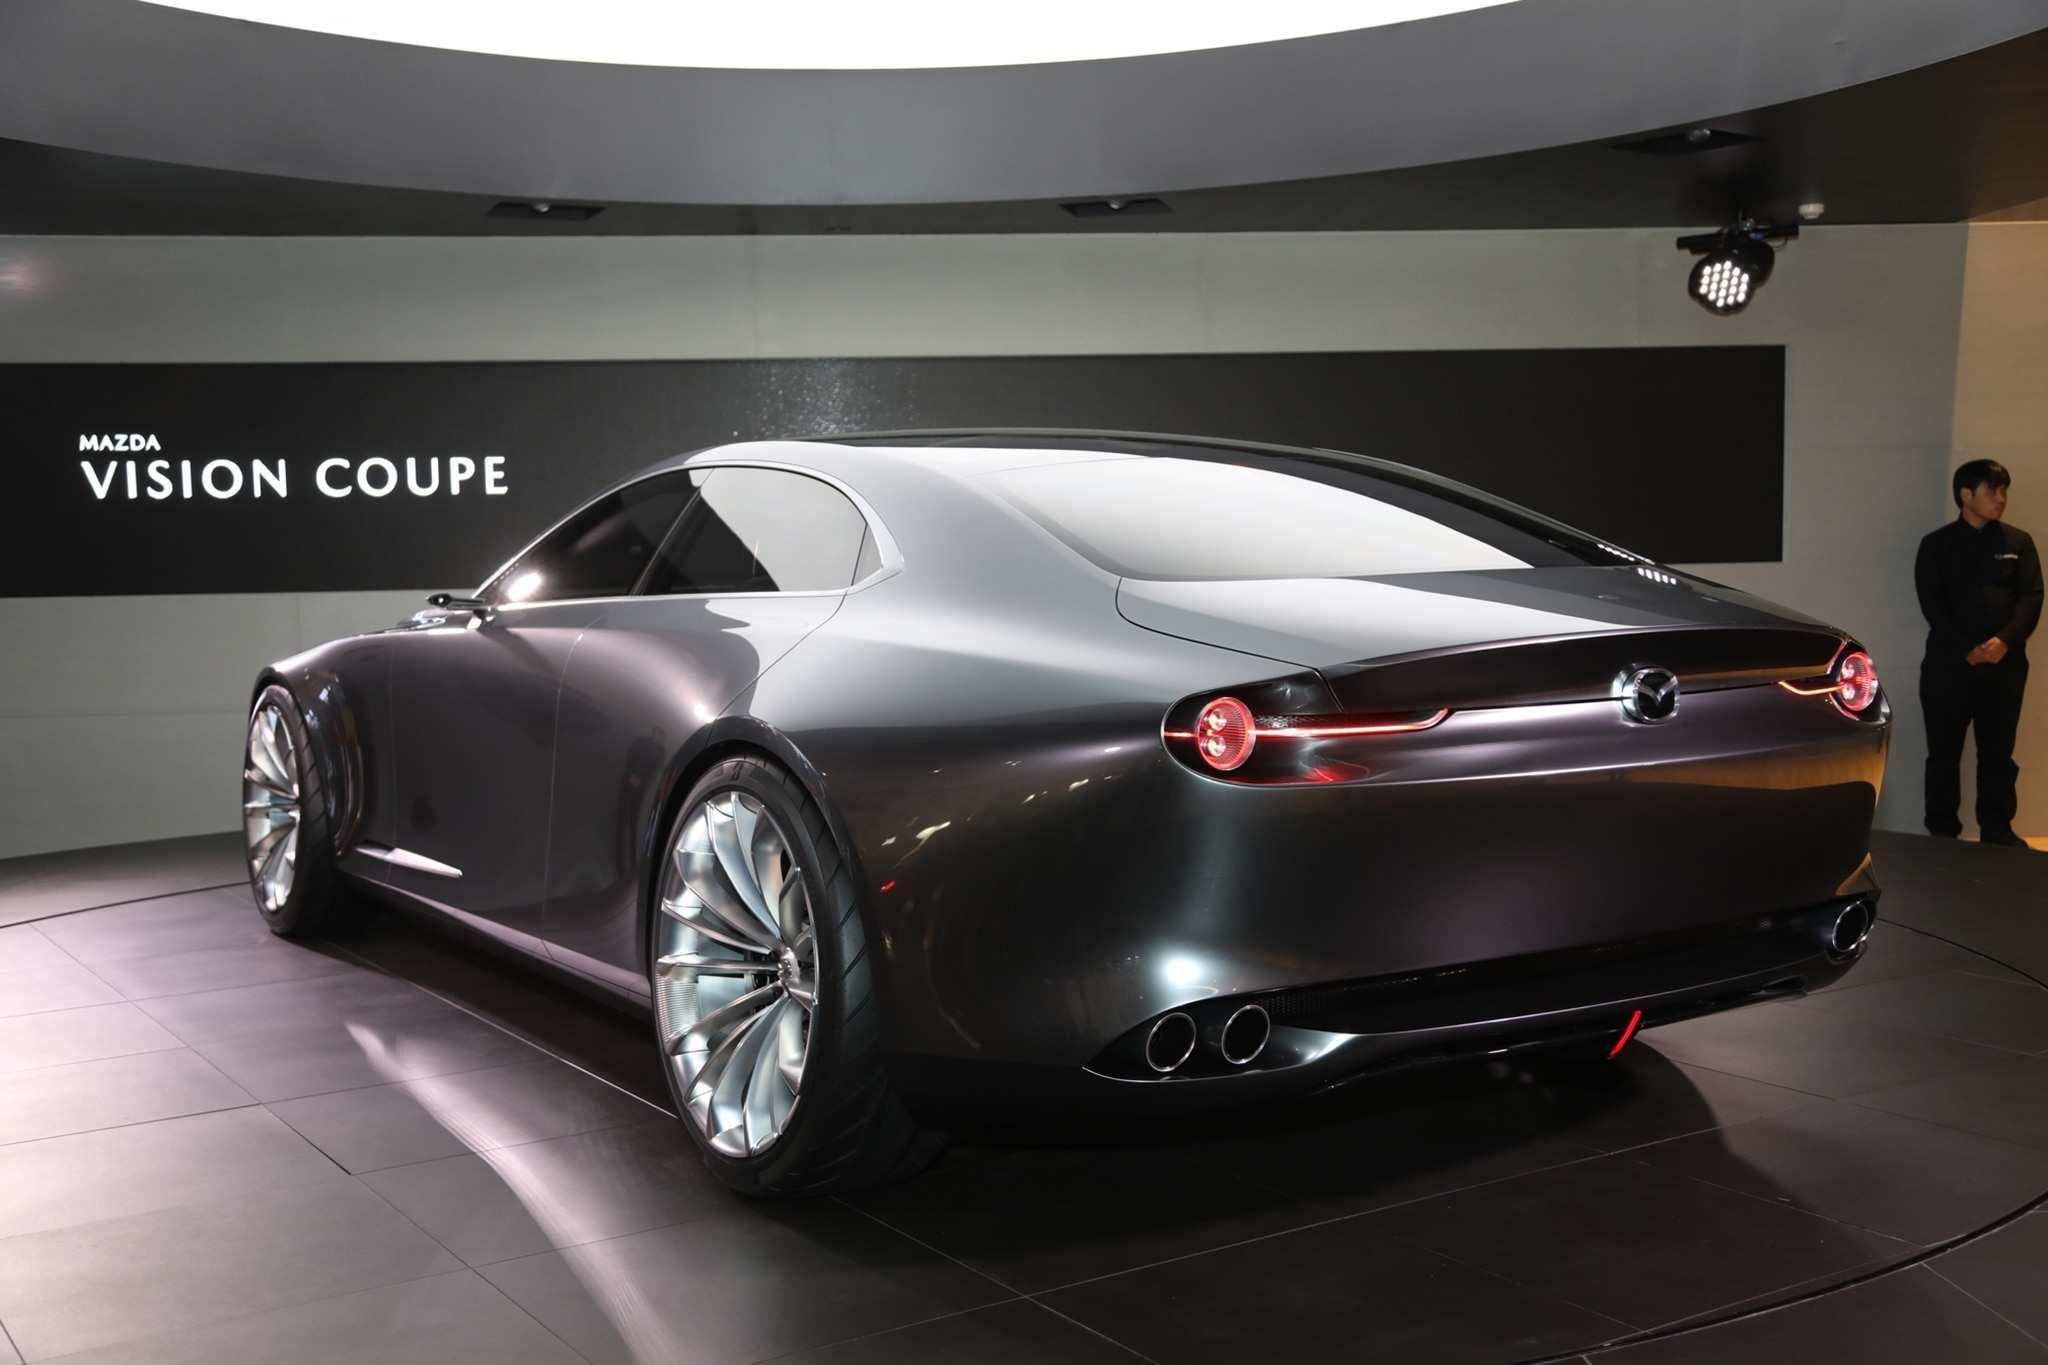 67 New The 2019 Mazda Vision Coupe Price Concept History by The 2019 Mazda Vision Coupe Price Concept